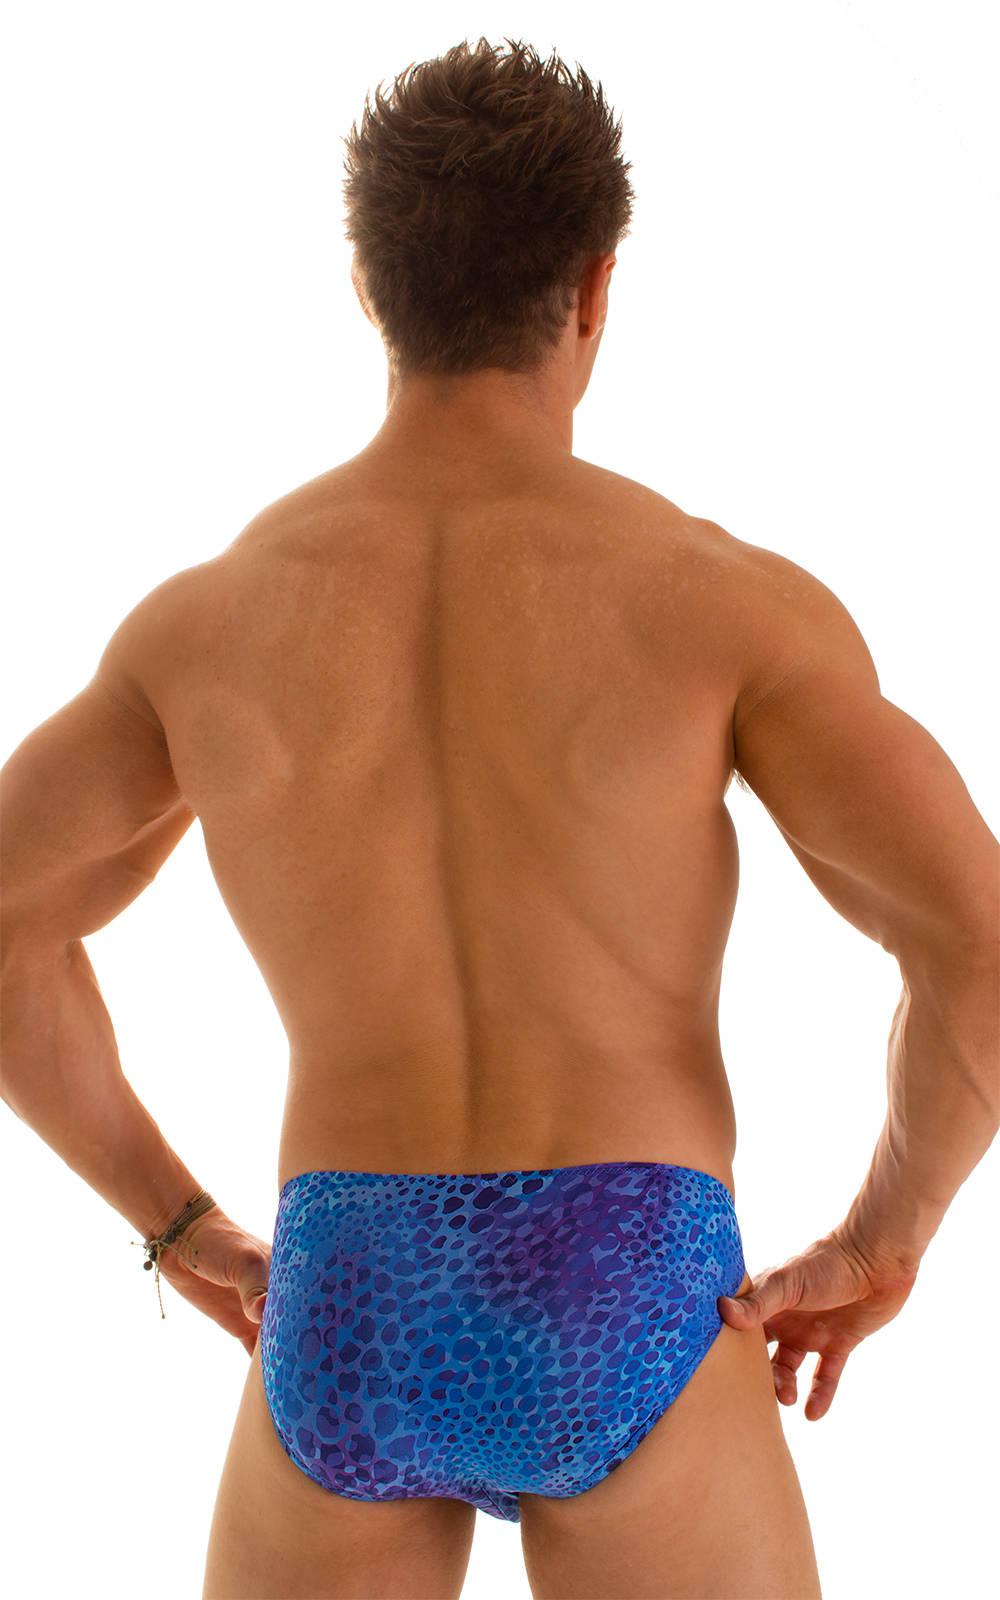 Bikini-Brief Swimsuit in Super ThinSKINZ Deep Sea 2